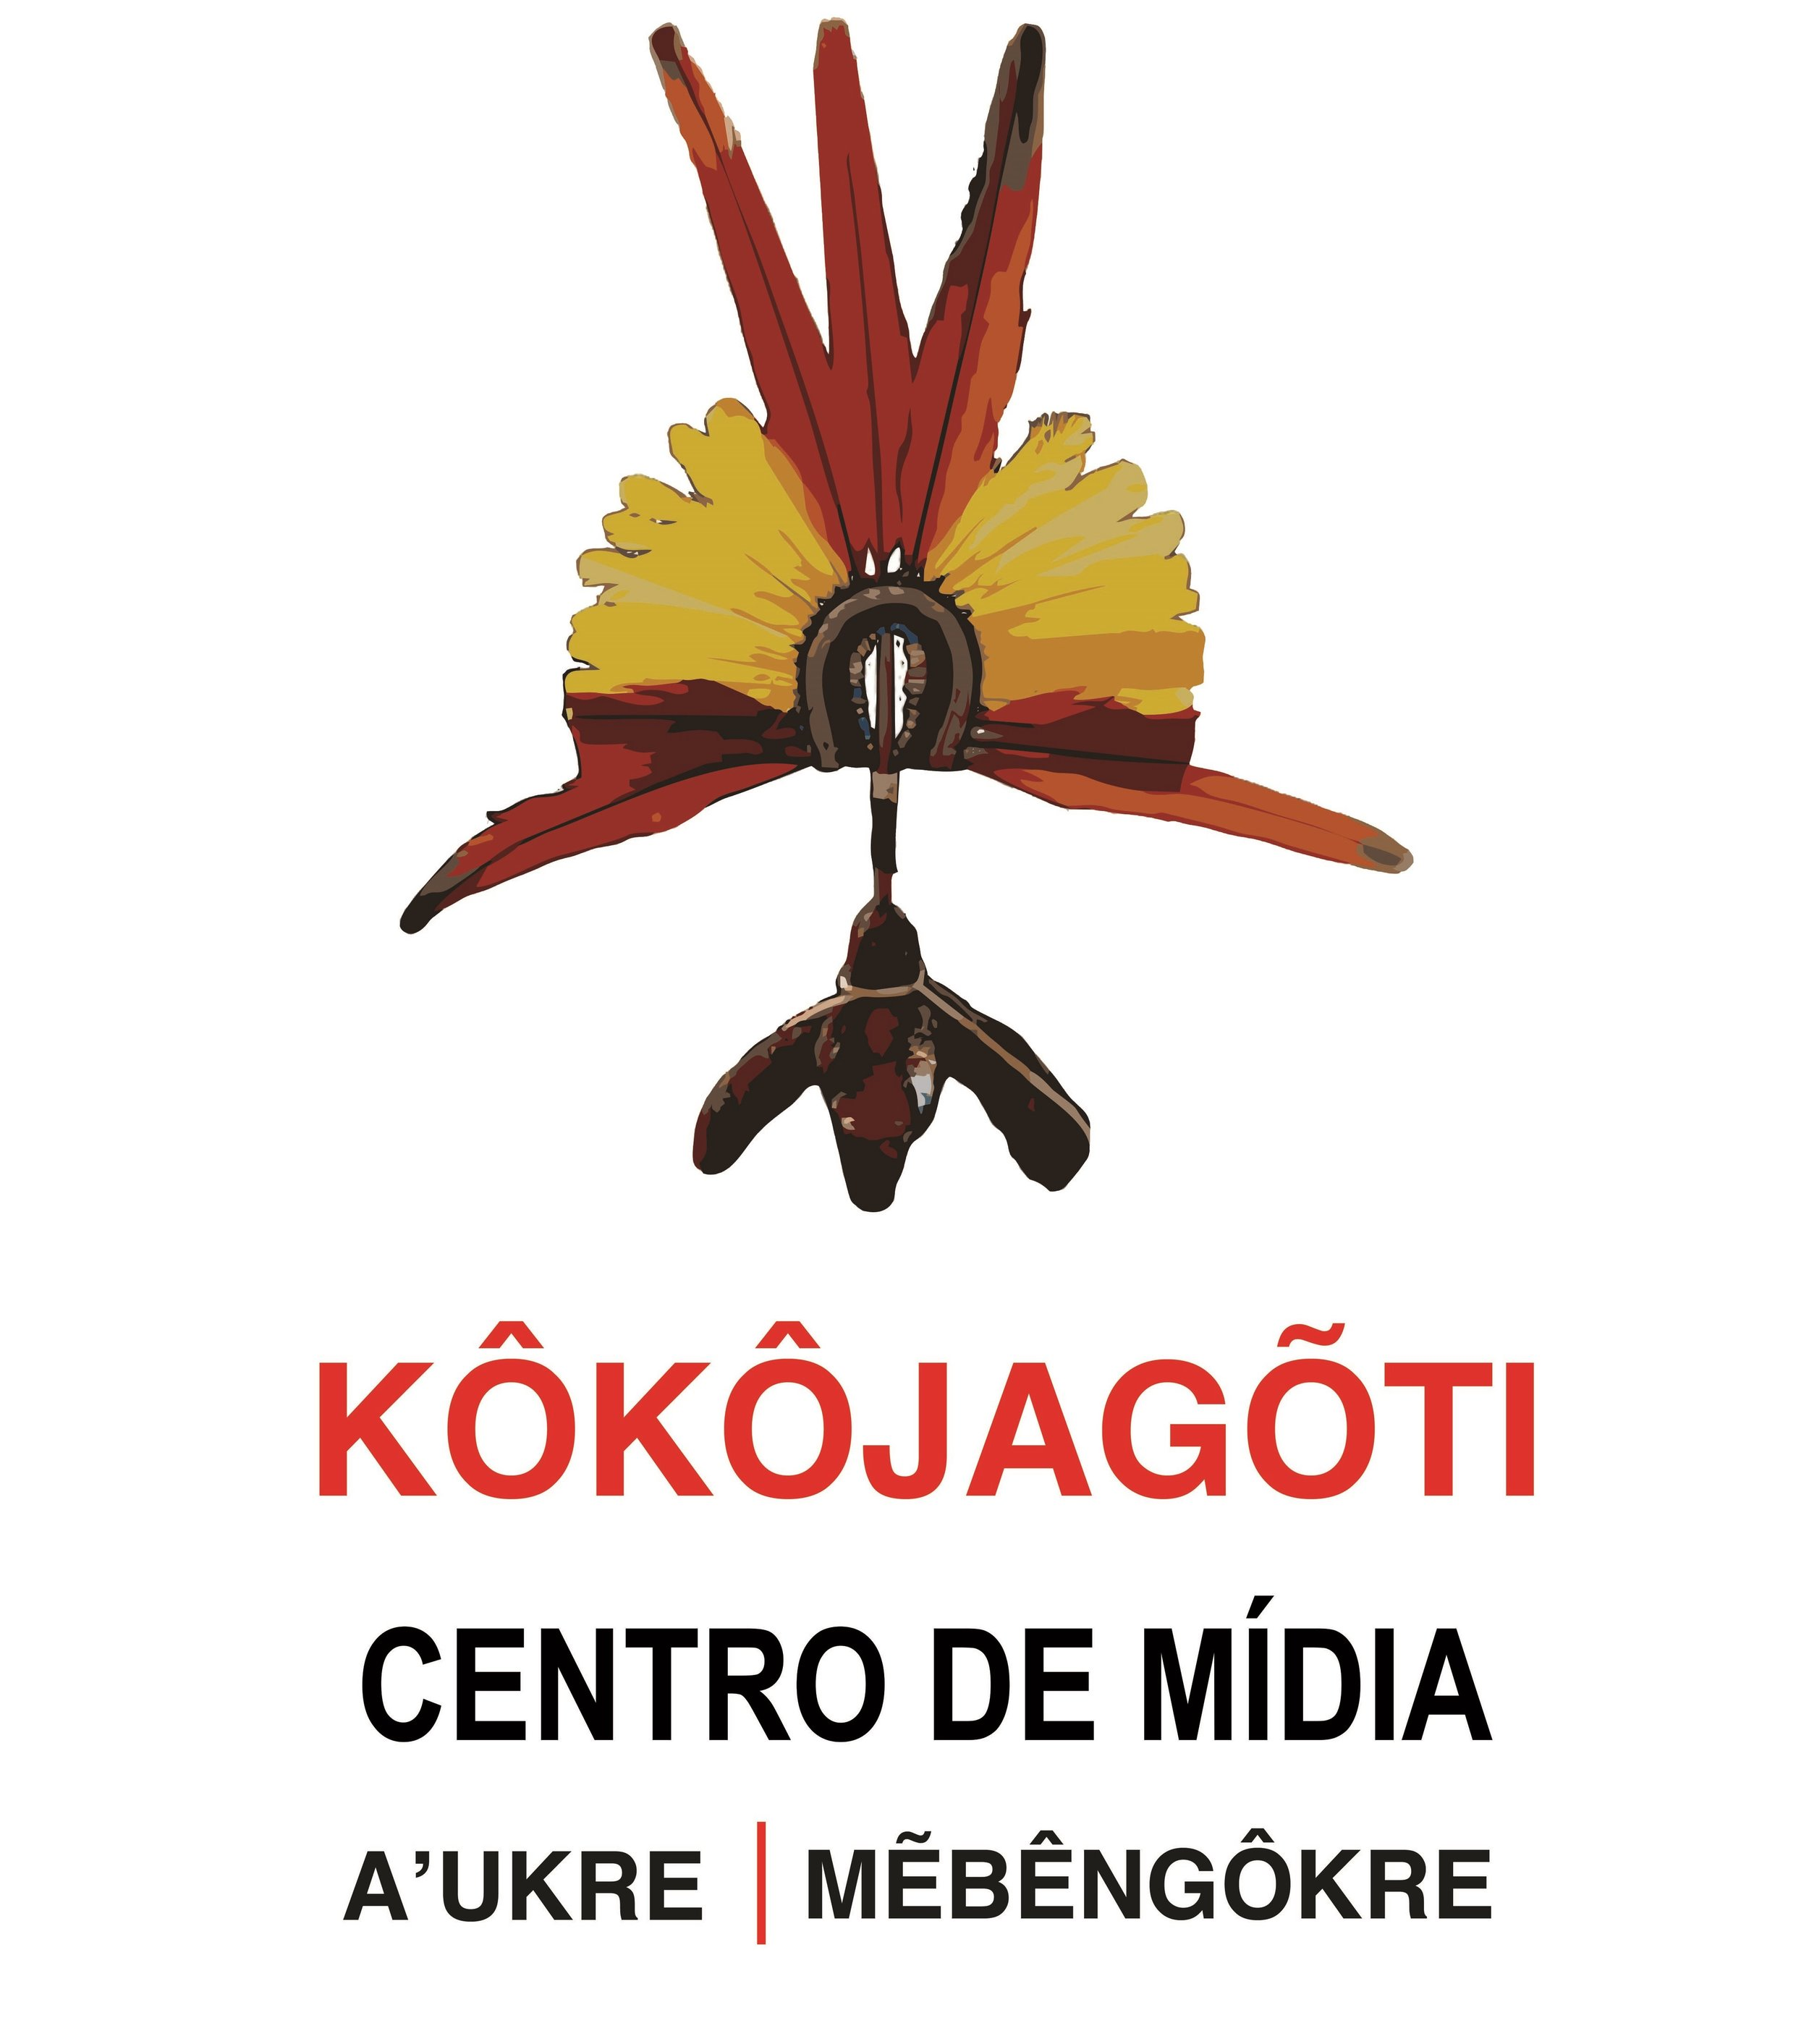 Kokojagoti LOGO 02.jpg